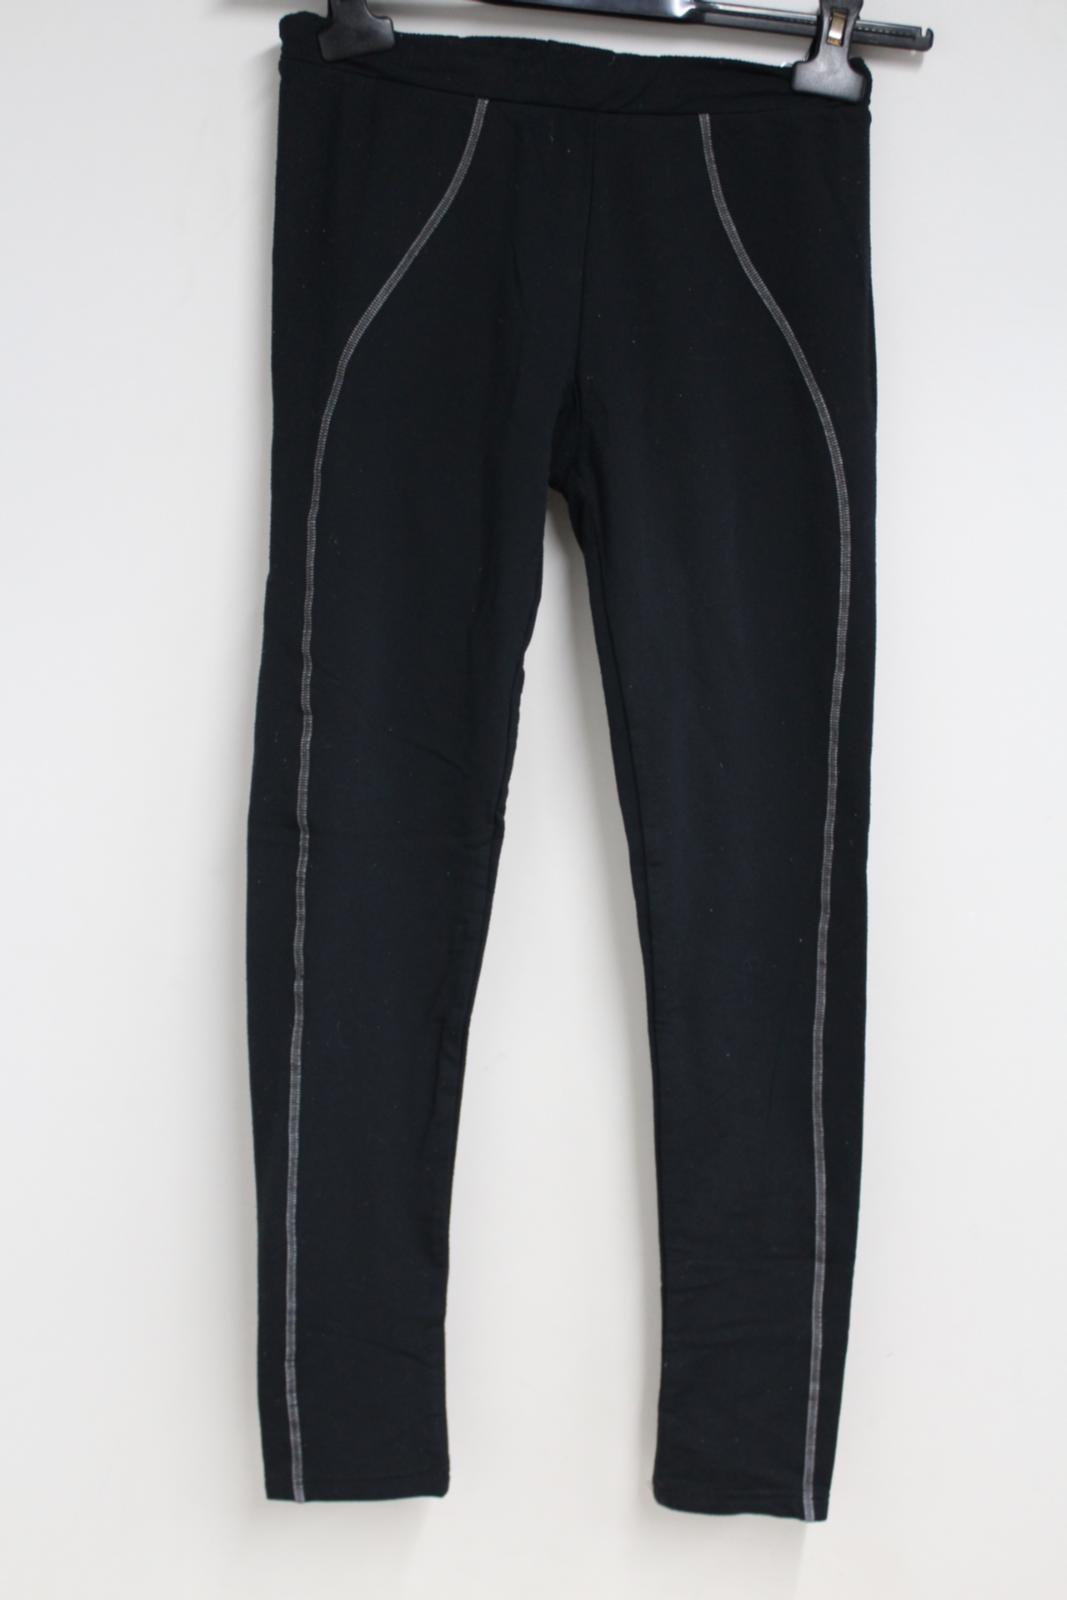 Sweaty-Betty-Ladies-Negro-Chandal-Activewear-Fitness-Leggings-Talla-S-W24-L26 miniatura 12